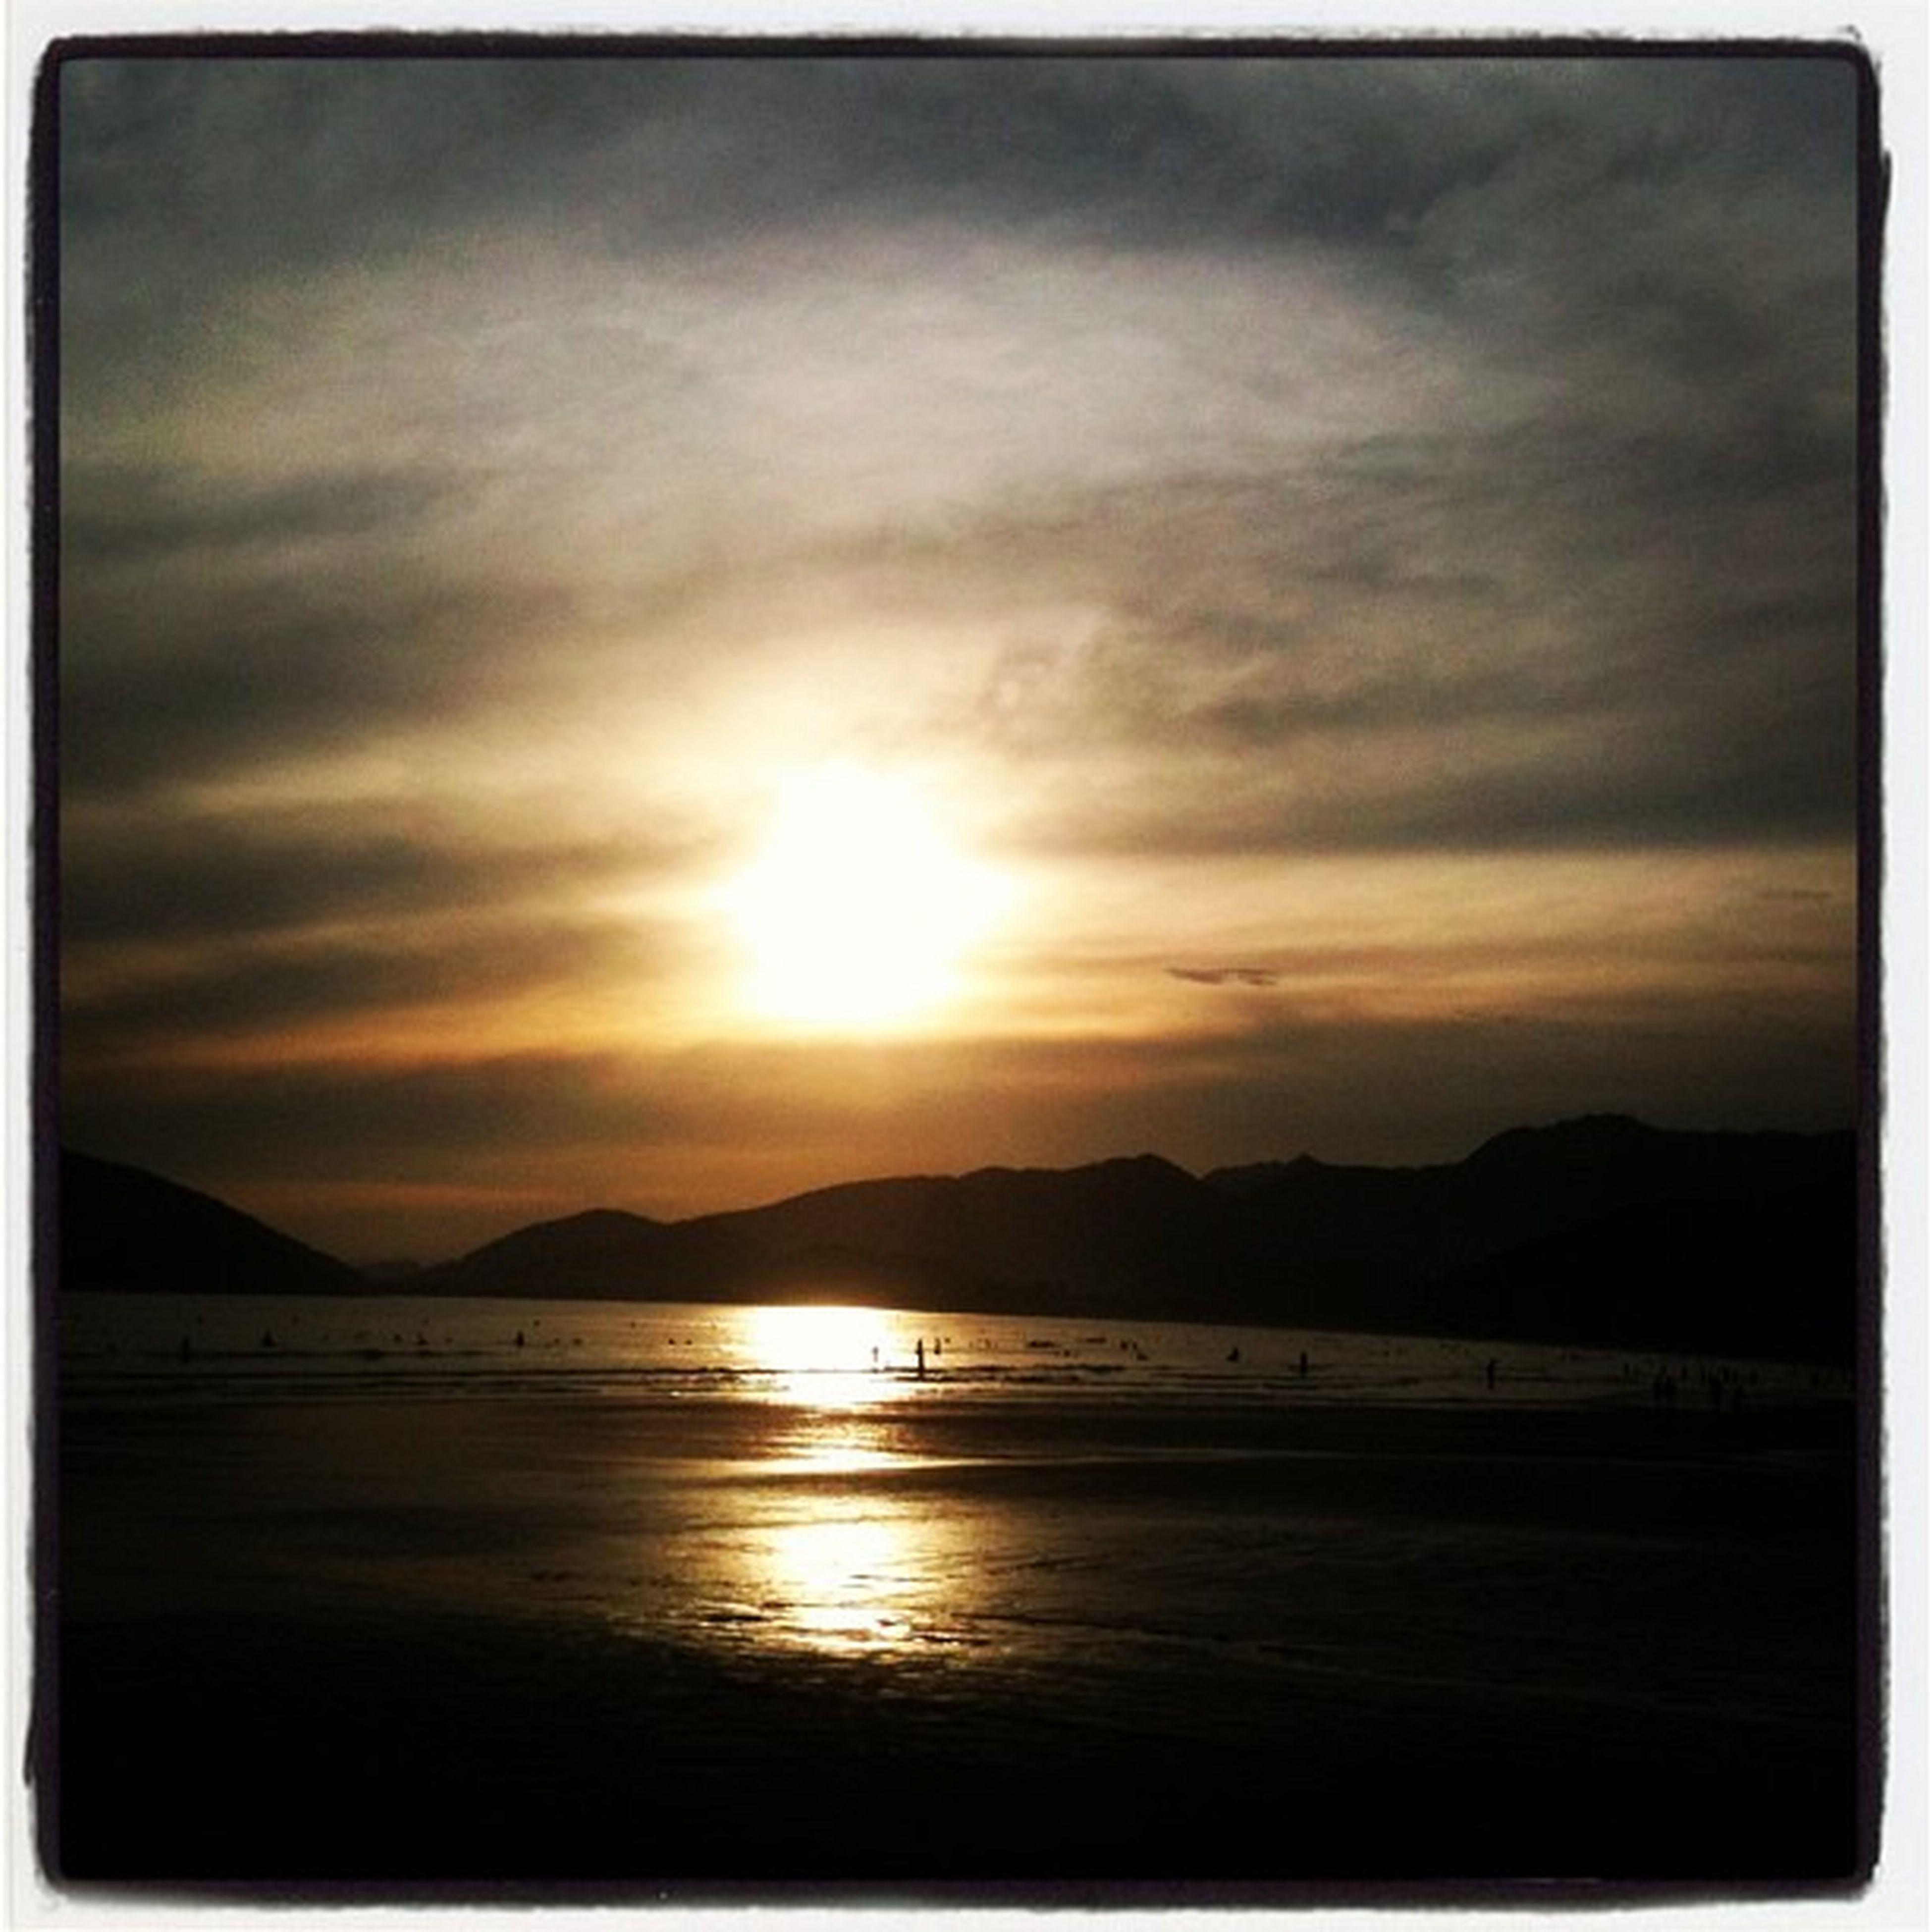 sunset, water, scenics, tranquil scene, sun, beauty in nature, sky, tranquility, mountain, transfer print, sea, reflection, nature, cloud - sky, idyllic, mountain range, auto post production filter, sunlight, cloud, sunbeam